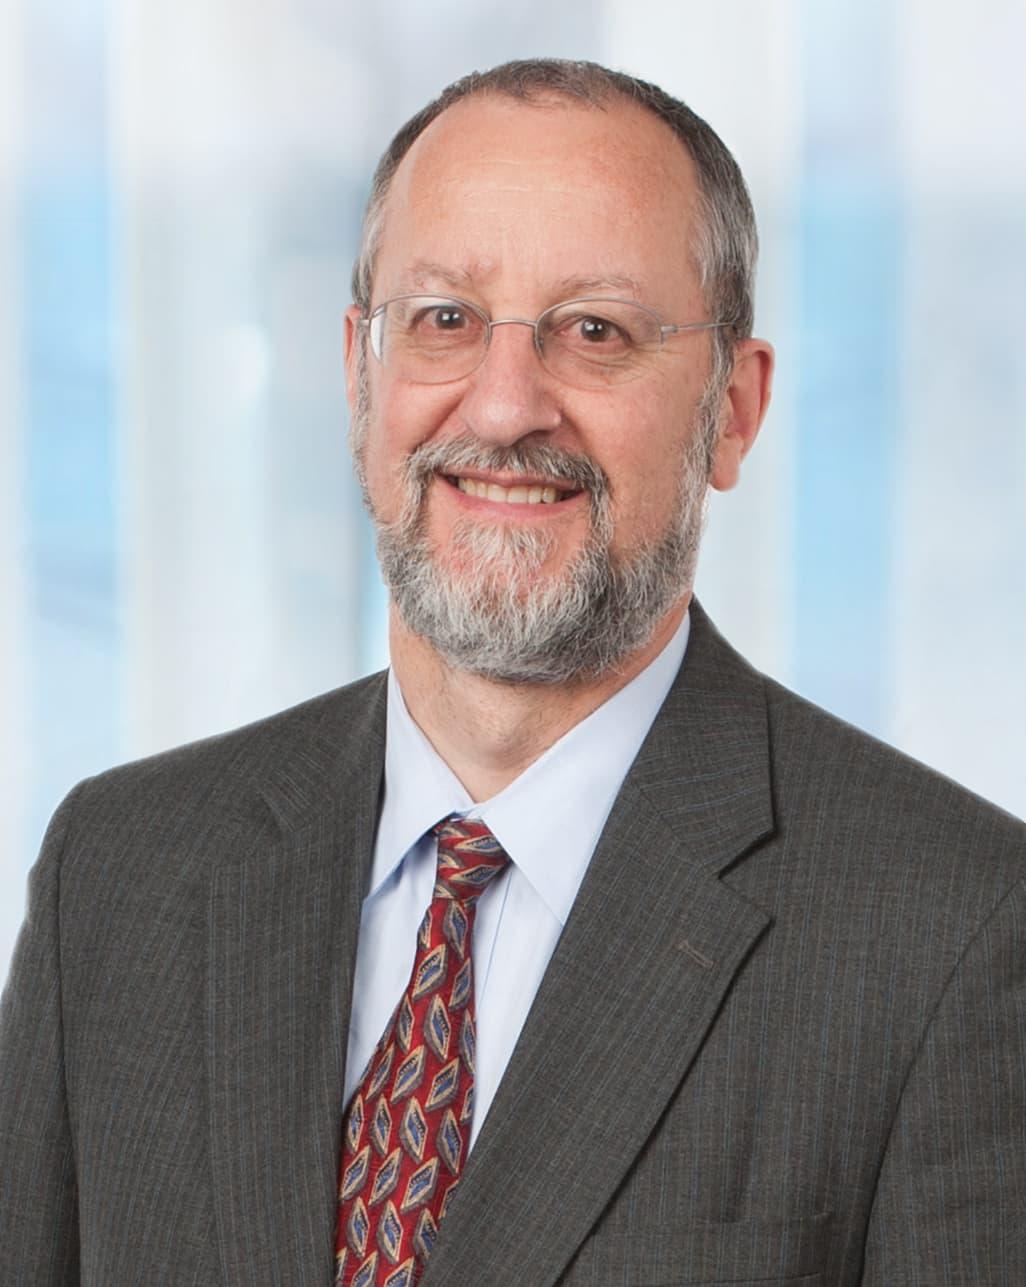 Brian-M.-Murray,-MD